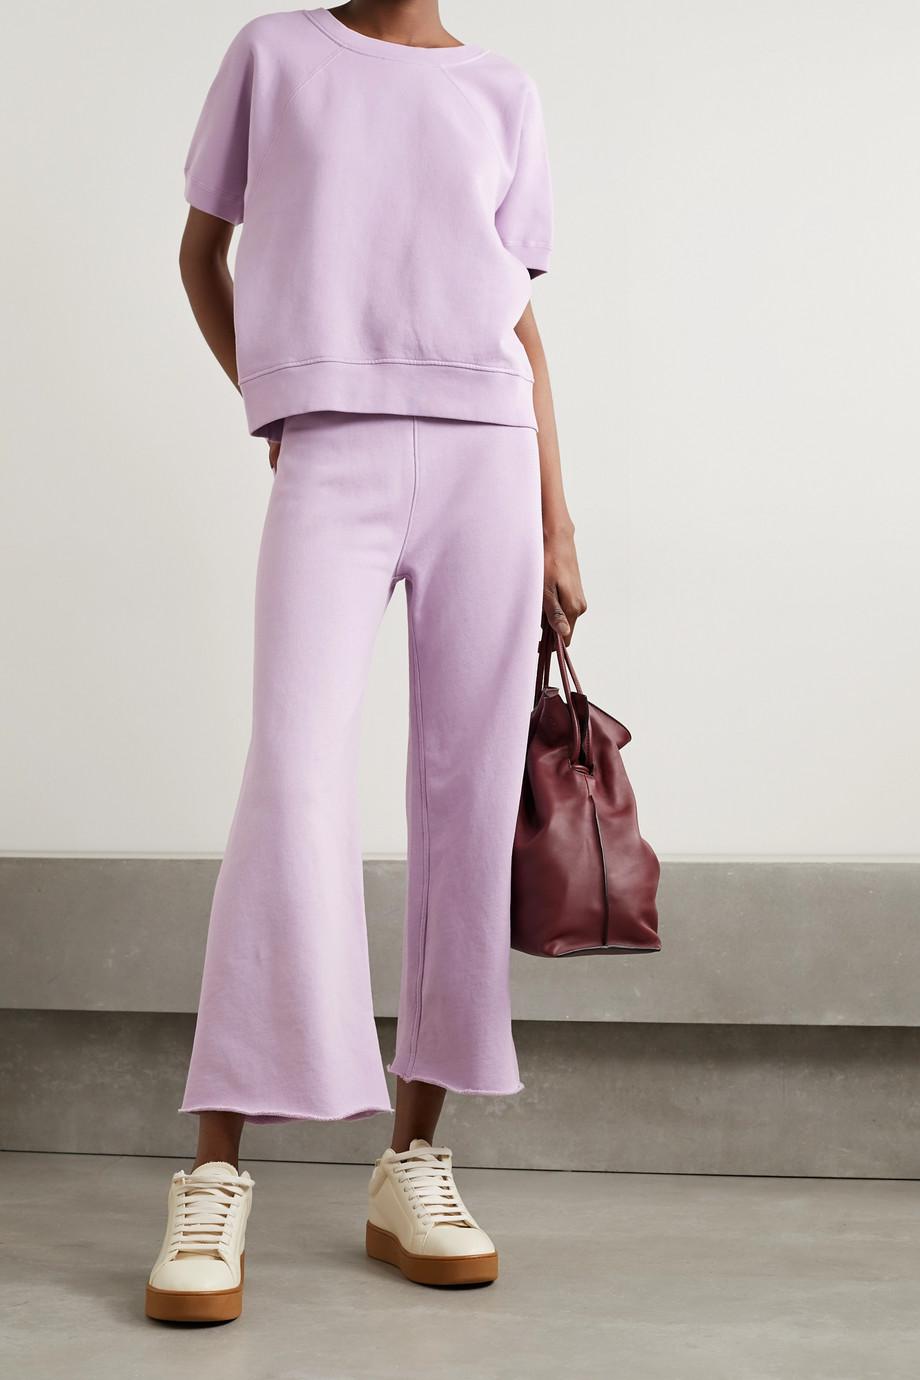 Nili Lotan Ciara cotton-jersey top